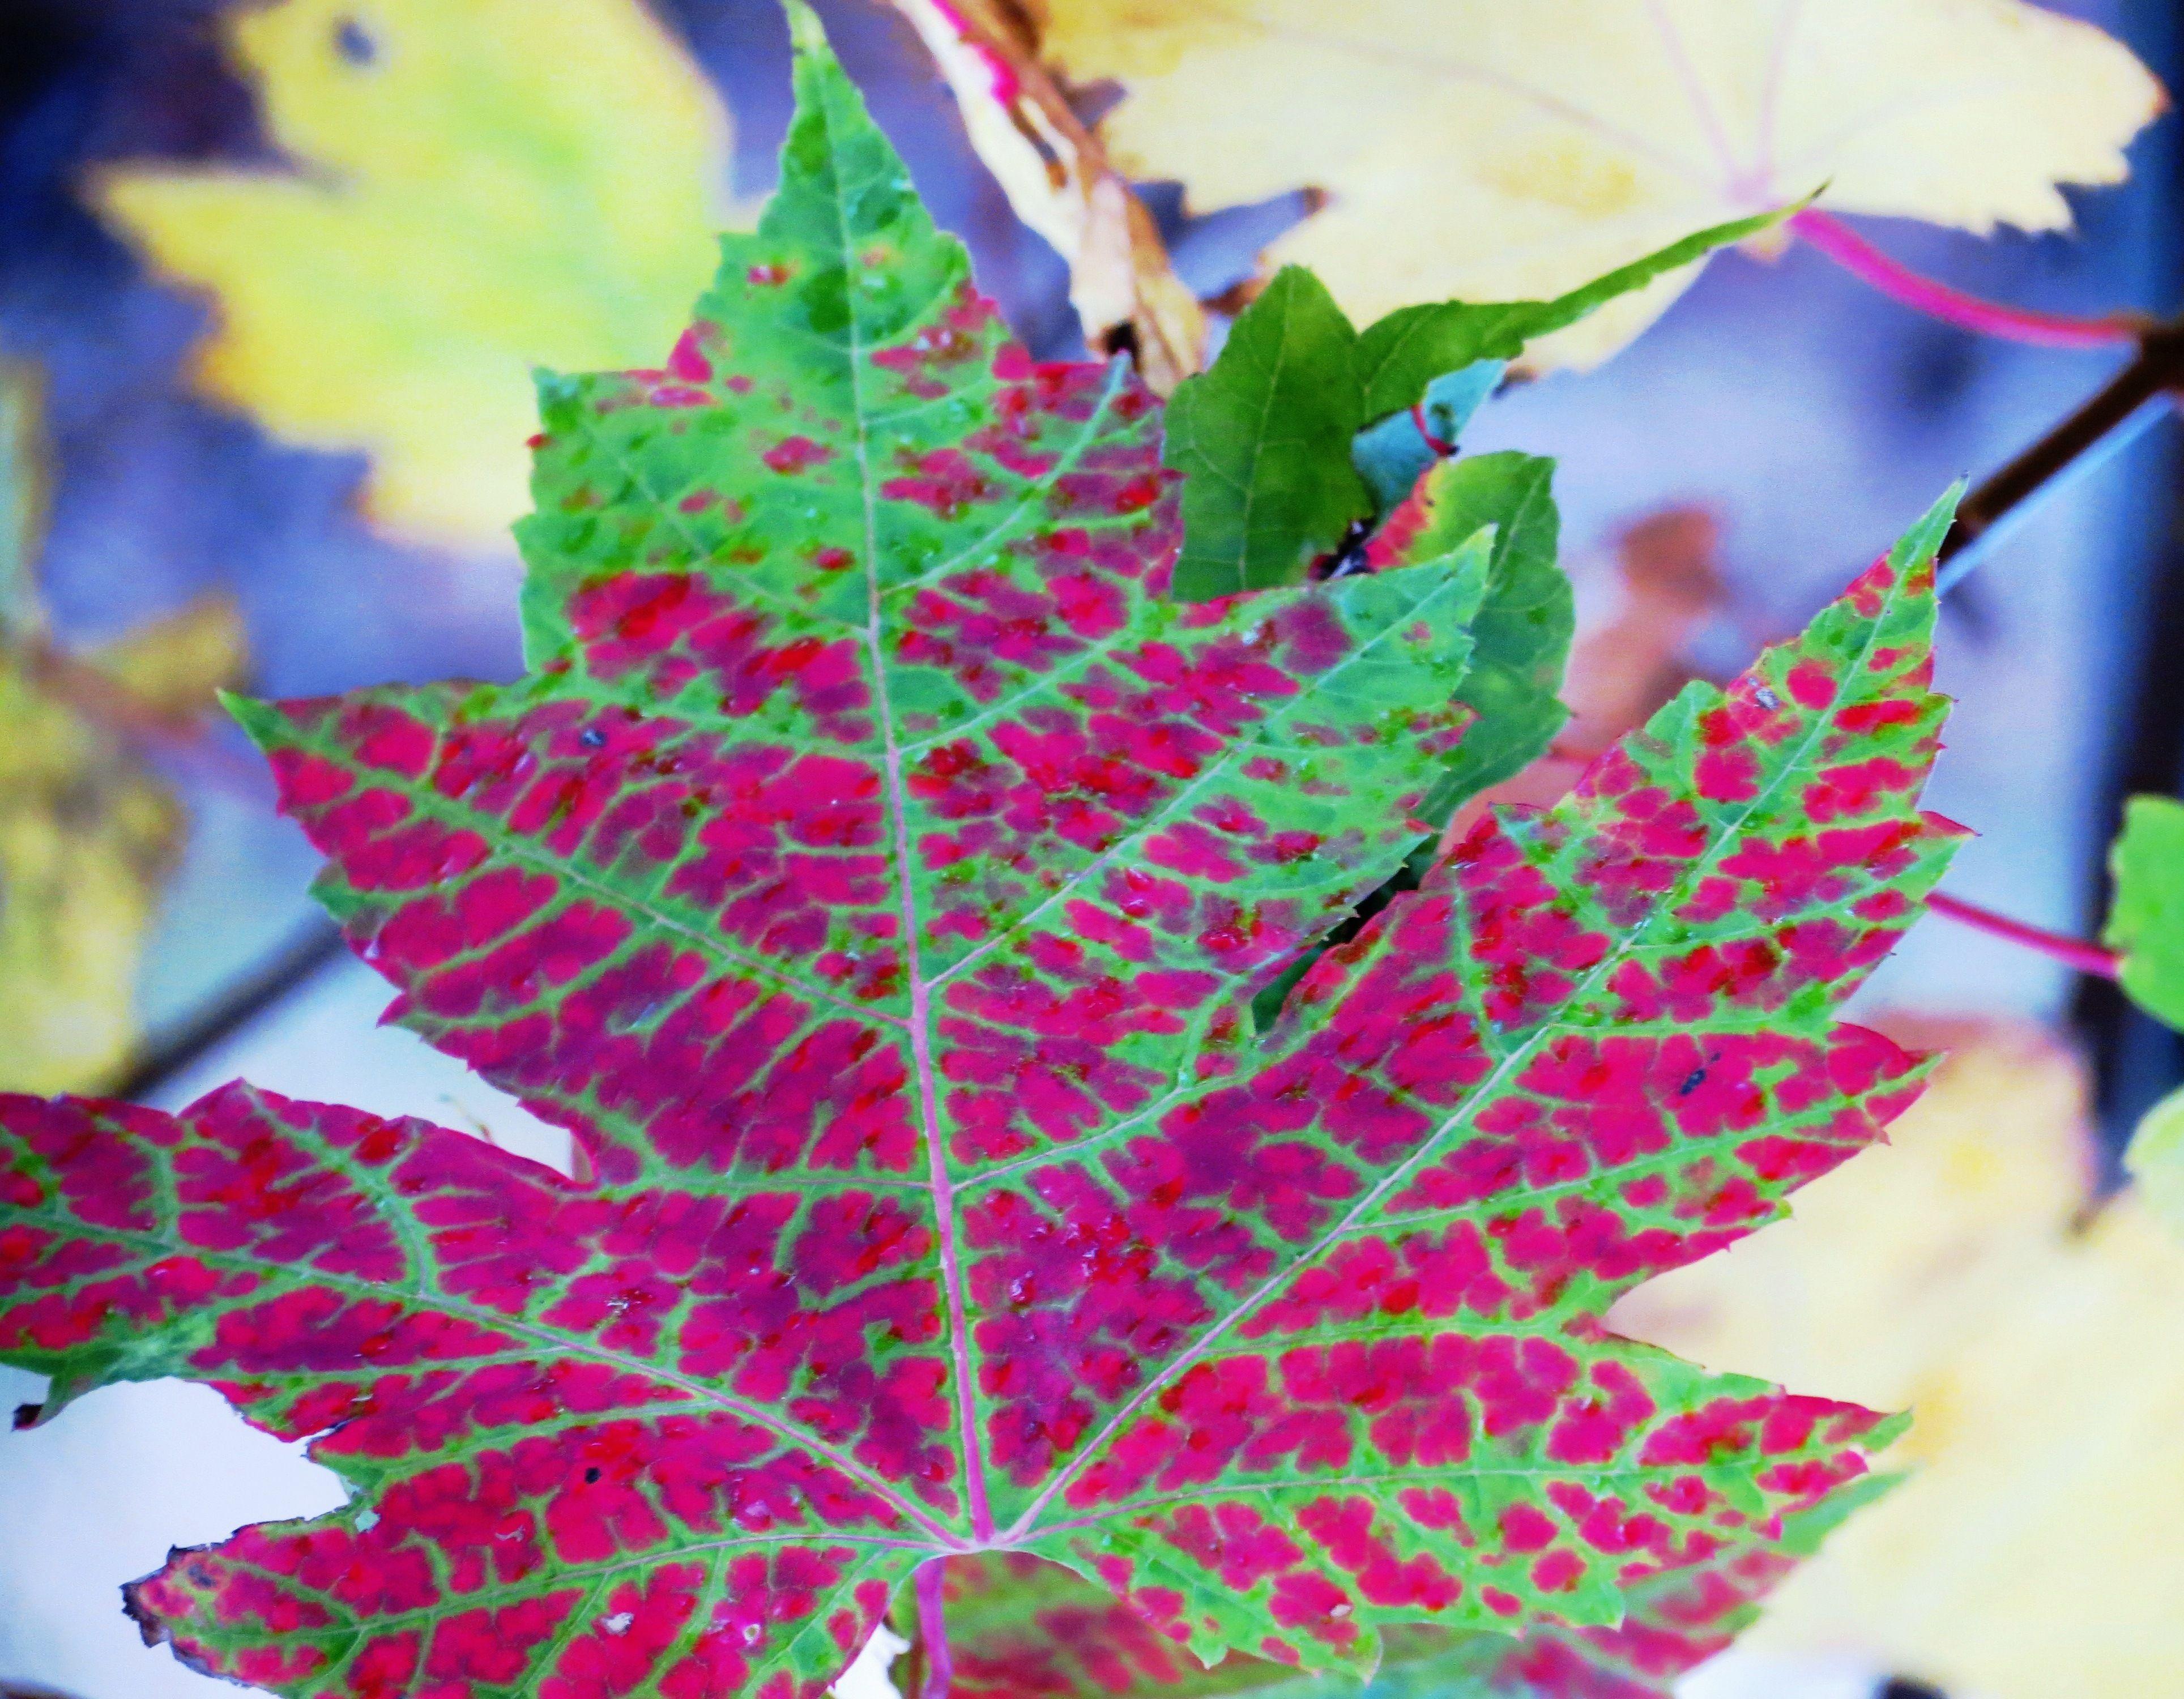 #Autumncolors, #GTA, #ParcDownsviewPark, #DownsviewPark, #Toronto, #Ontario, #Canada, #CanadaLands